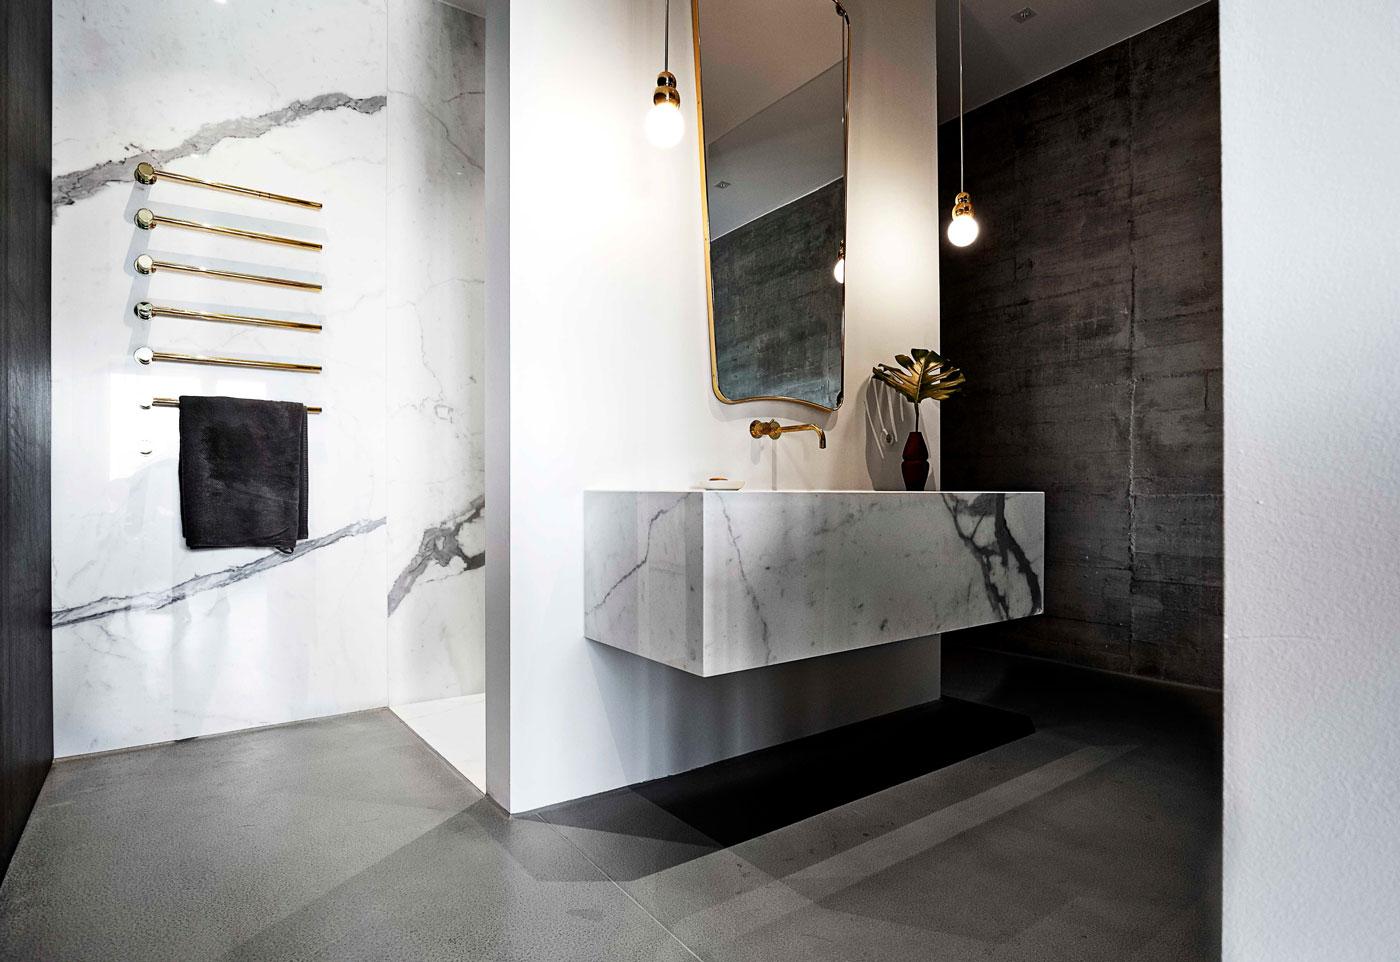 Bathroom marble wall, pendant lighting